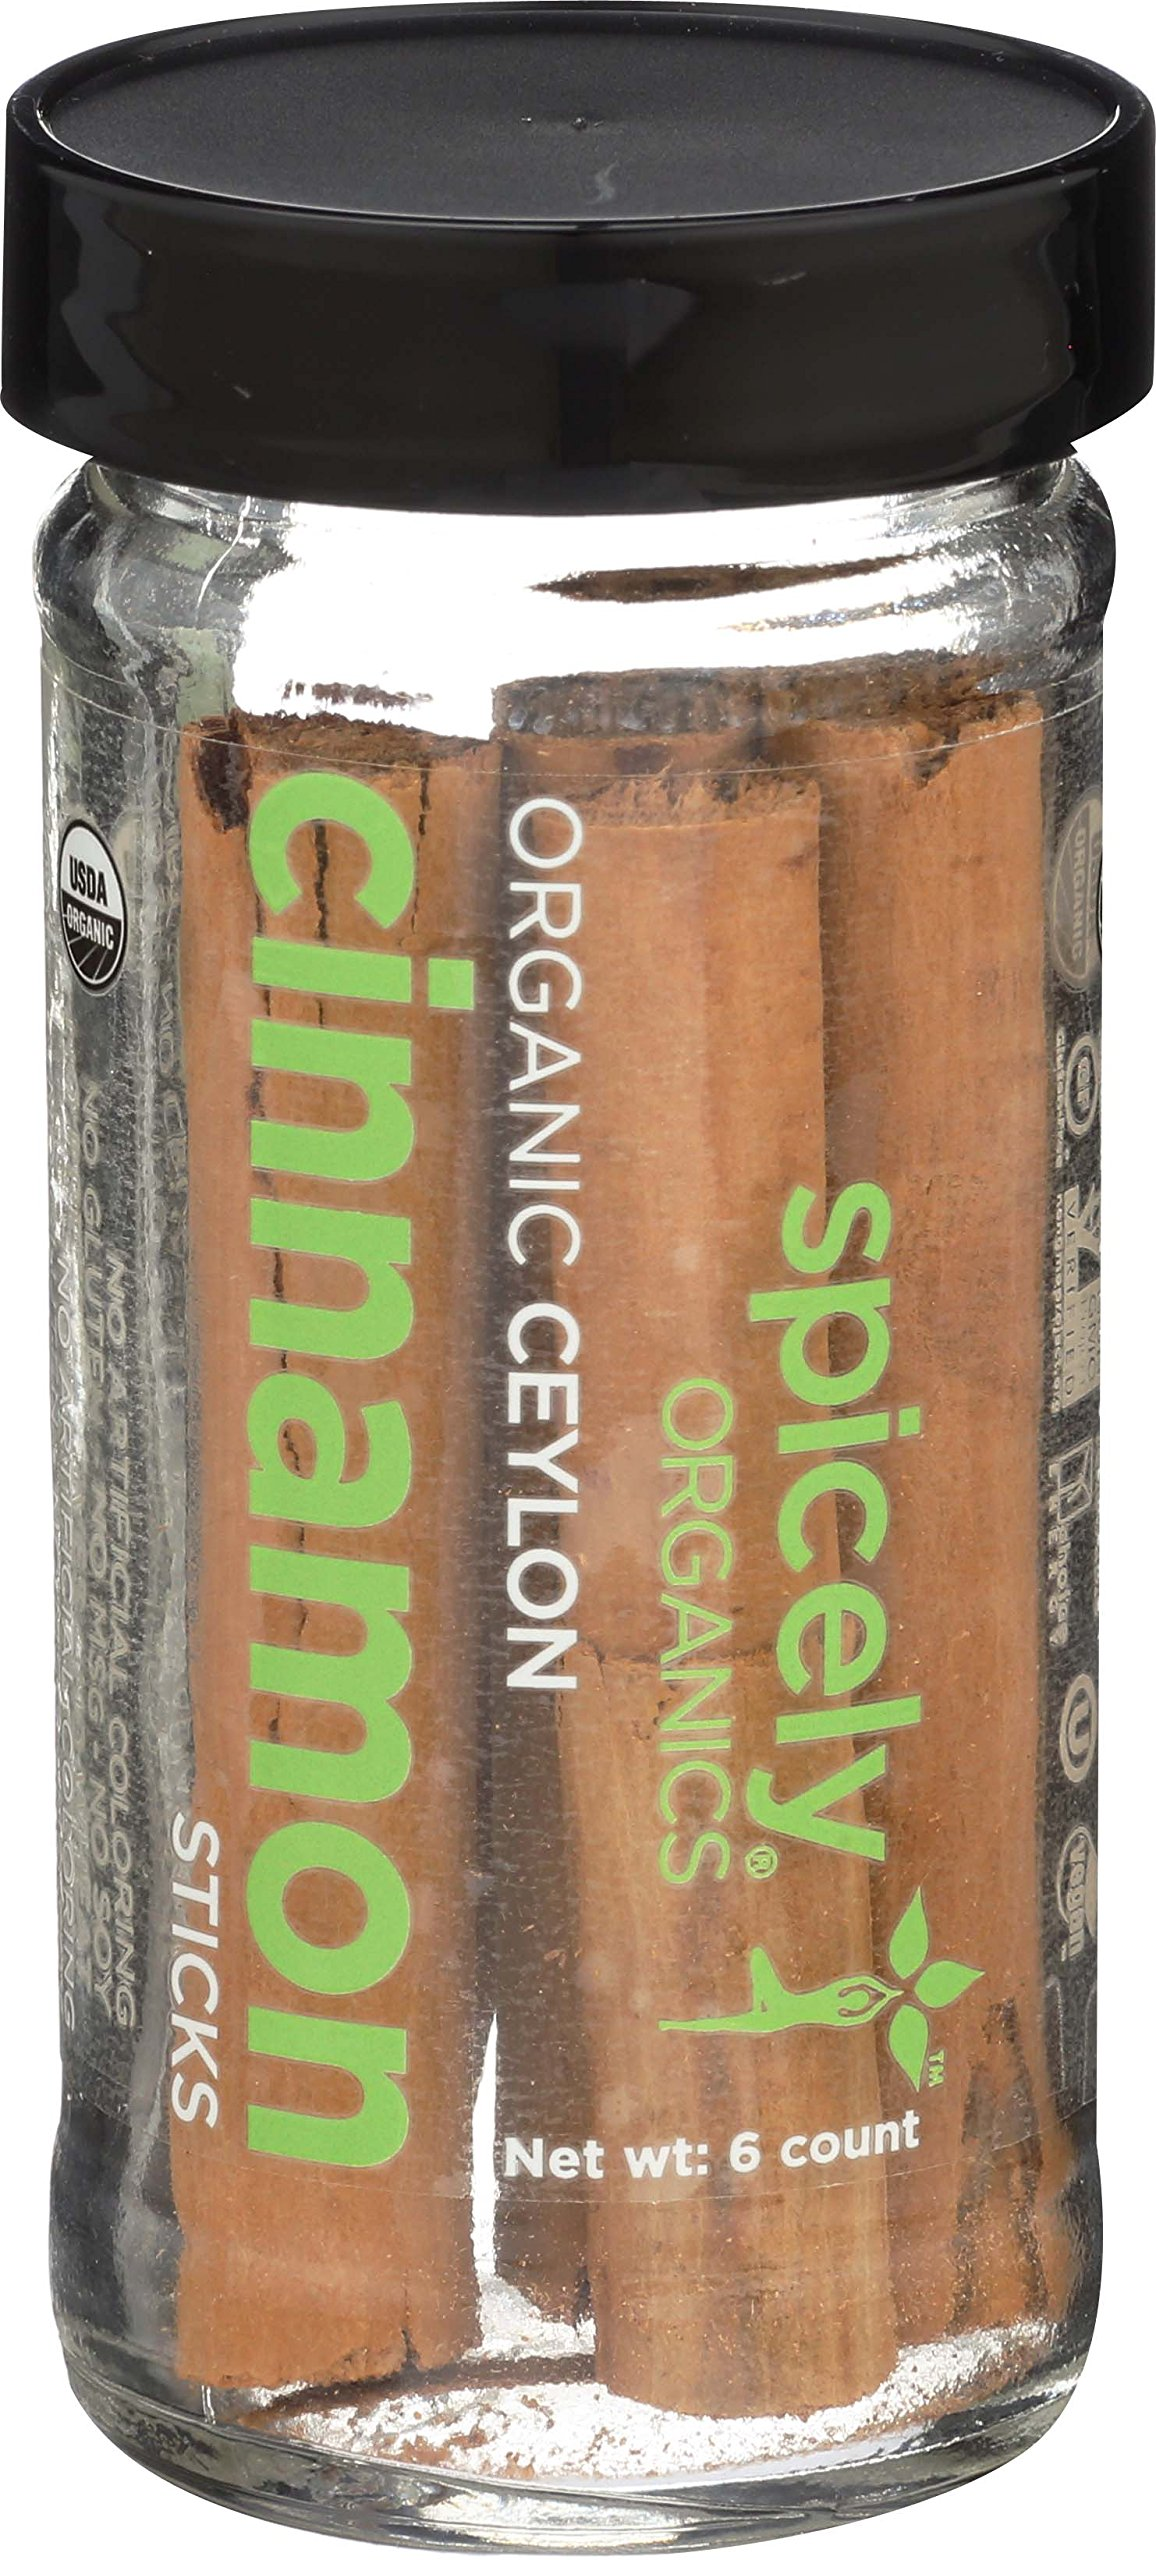 Spicely Organic Cinnamon True Sticks (Ceylon) 6 Count Jar Certified Gluten Free by Spicely Organics (Image #1)